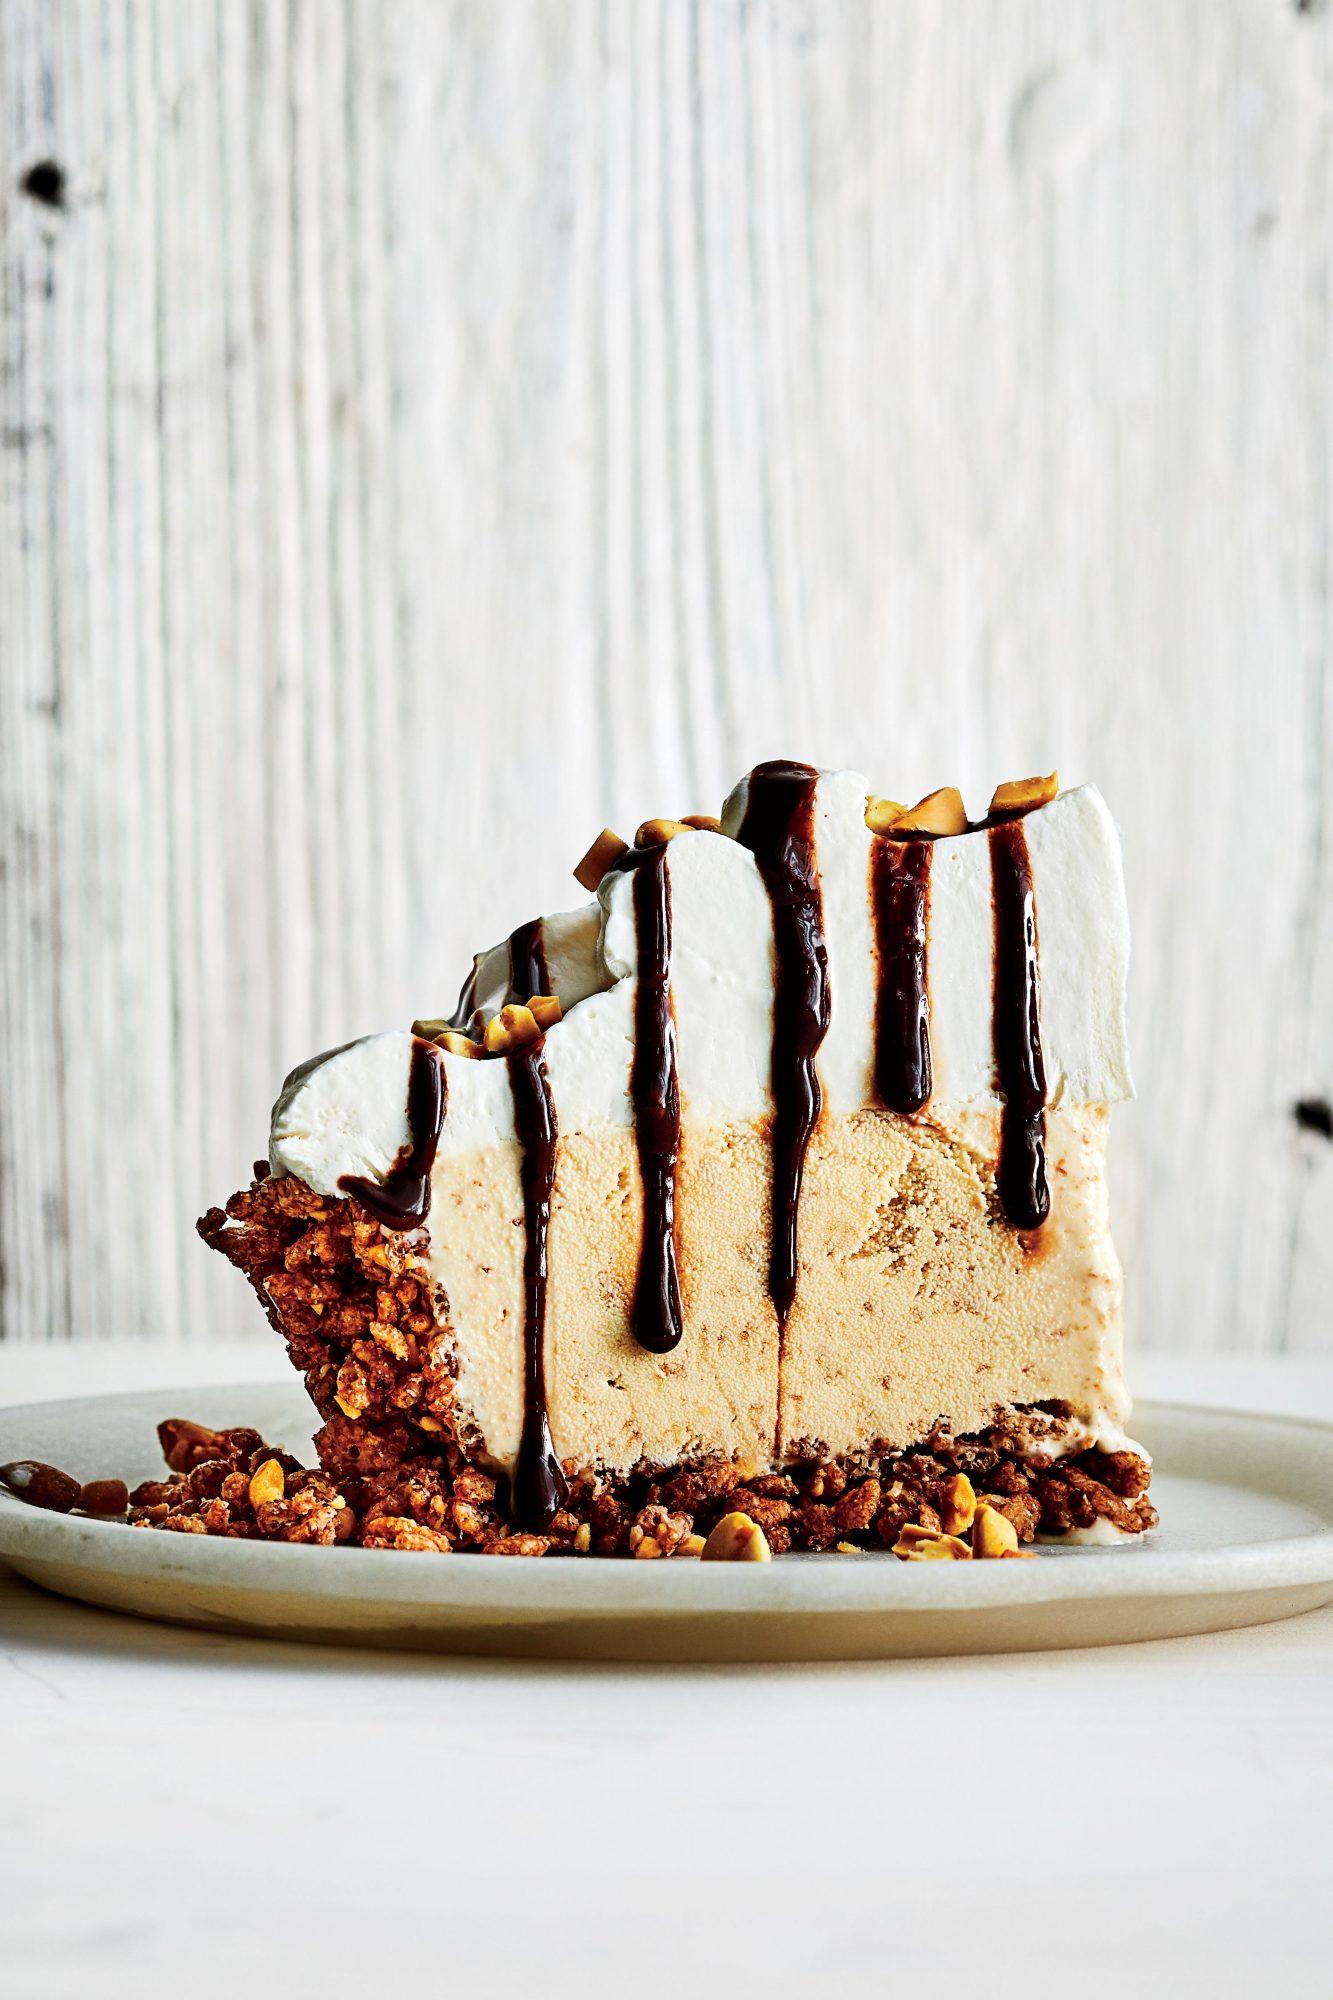 No-Bake Peanut Butter-Fudge Ice-Cream Pie